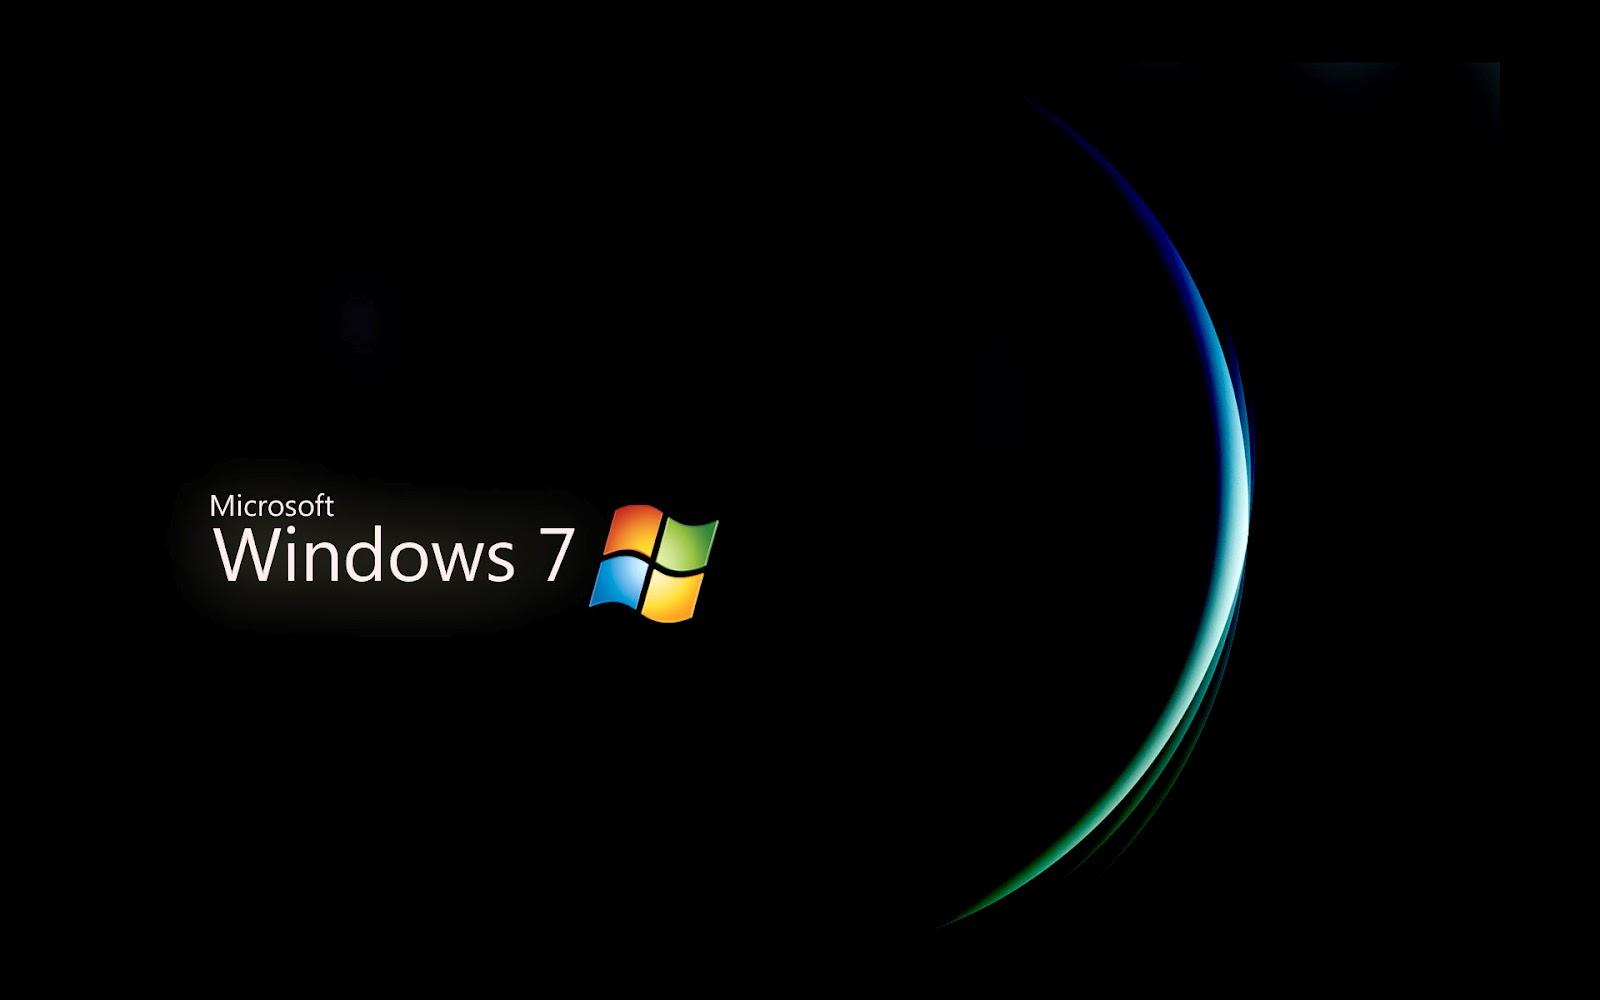 wallpaper desktop windows 7 - photo #25